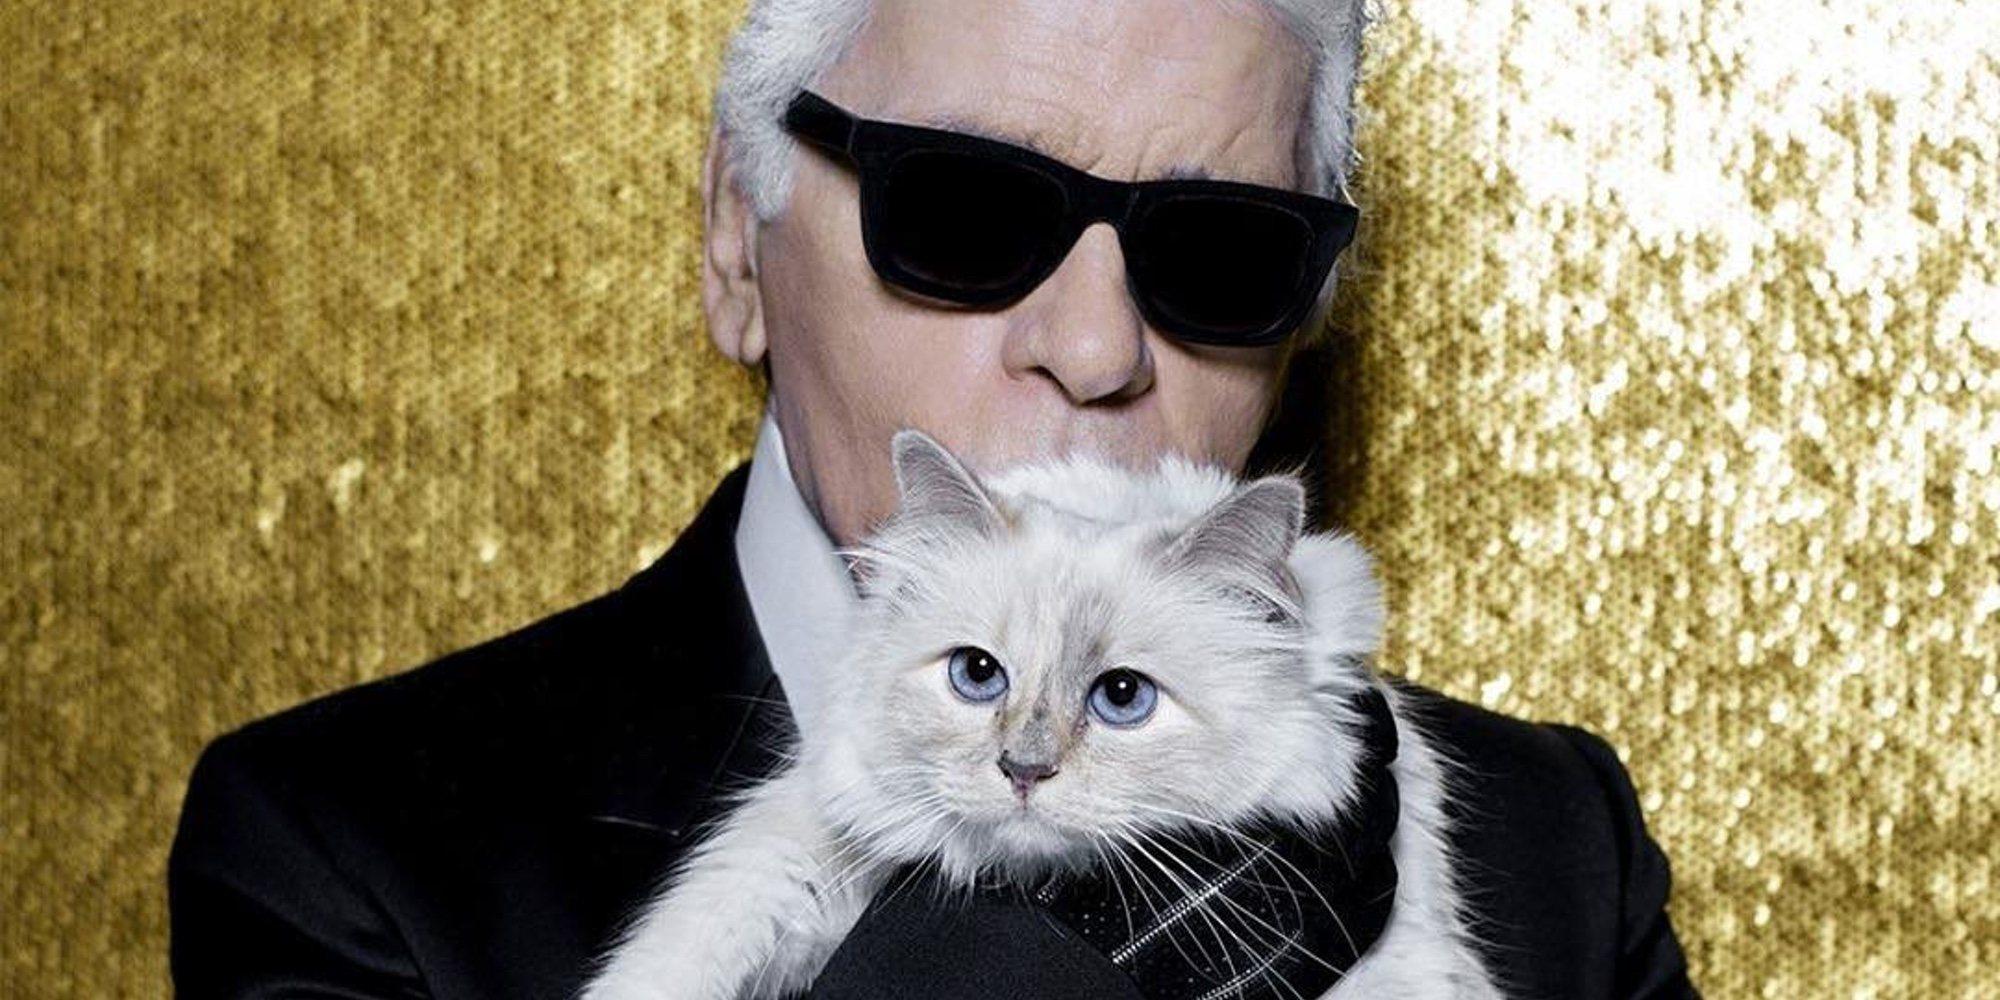 La gata de Karl Lagerfeld, la mayor heredera de su millonaria fortuna